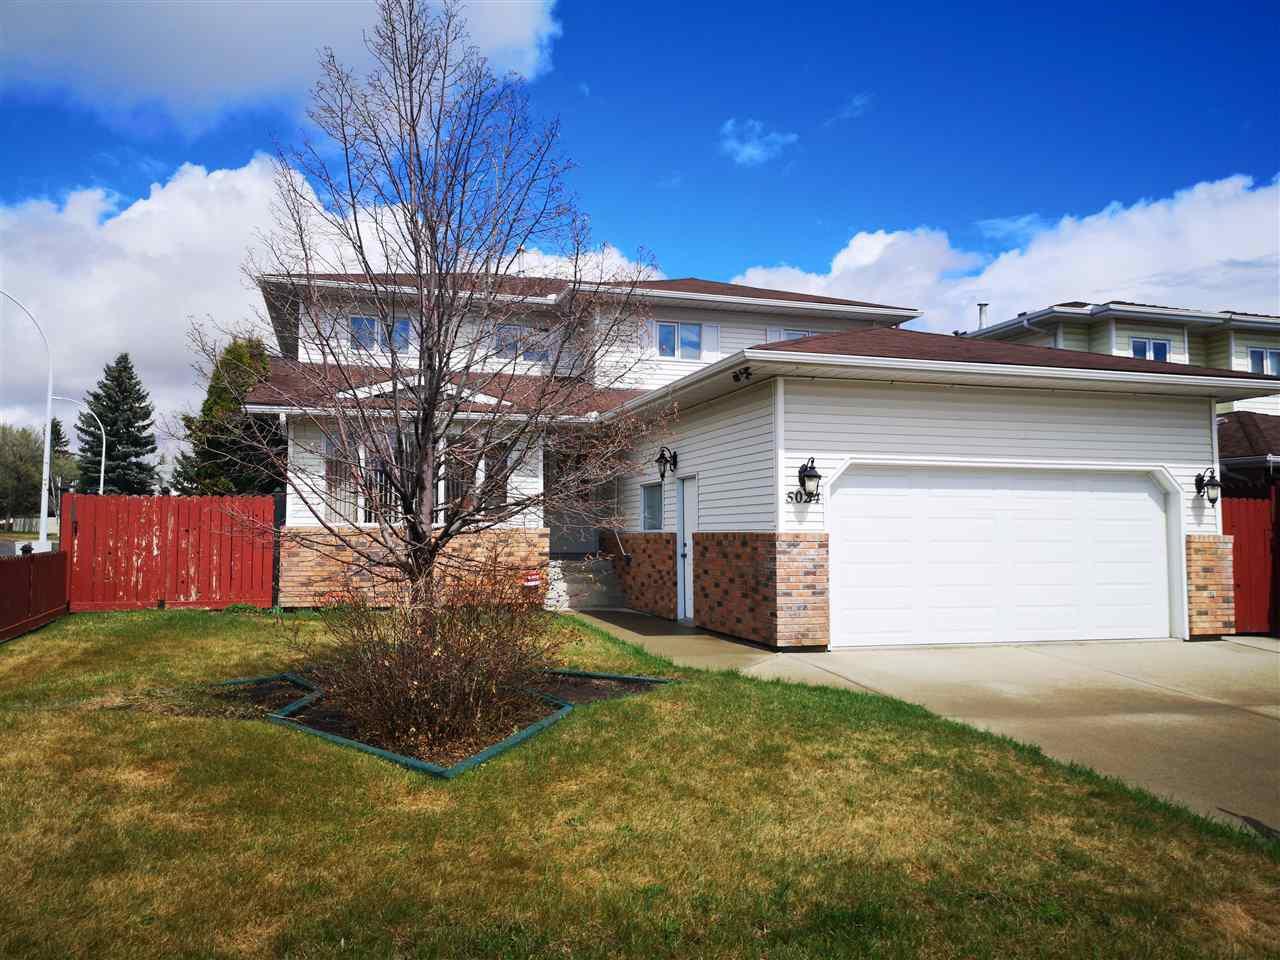 Main Photo: 5024 142 Avenue in Edmonton: Zone 02 House for sale : MLS®# E4191780